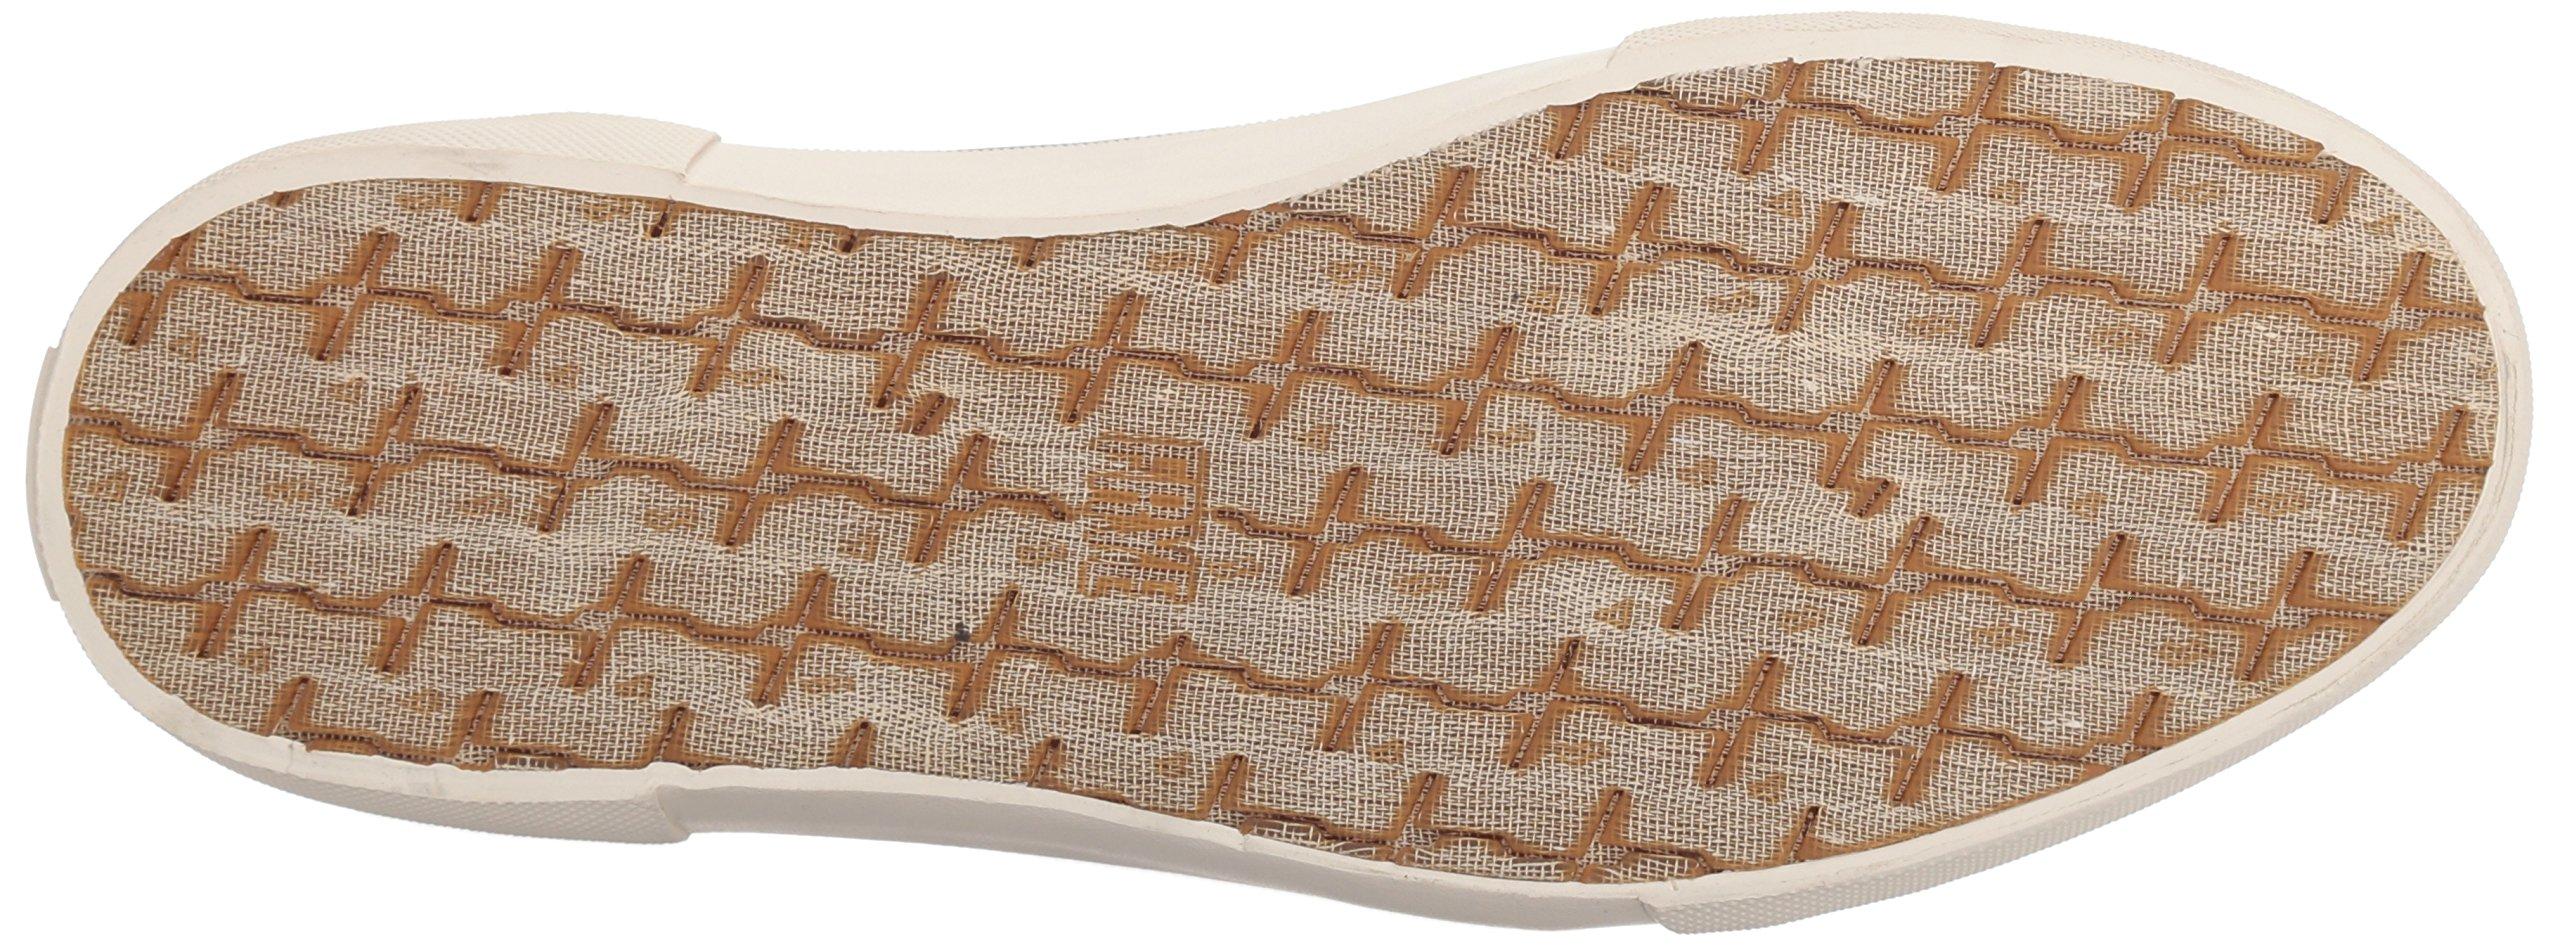 FRYE Men's Ludlow Cap Lowlace Sneaker, Navy, 11 Medium US by FRYE (Image #3)